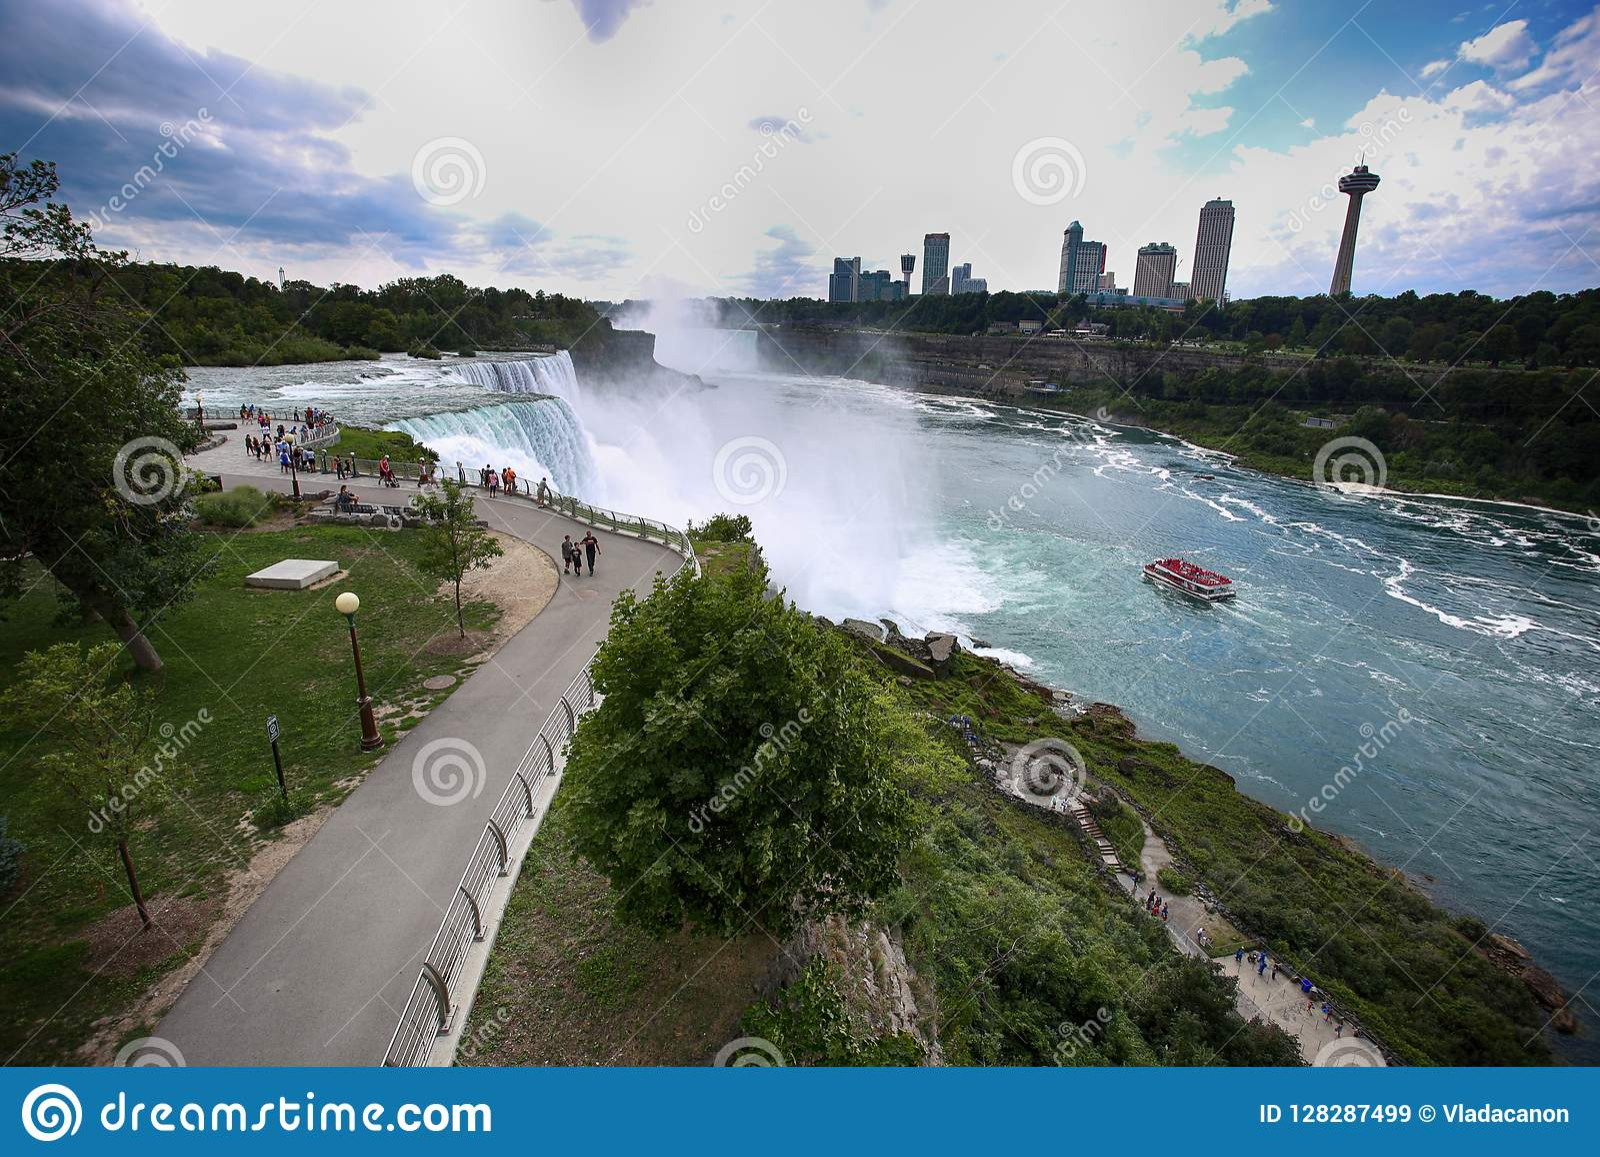 Niagara Falls Usa August 29 2018 Tourists View The